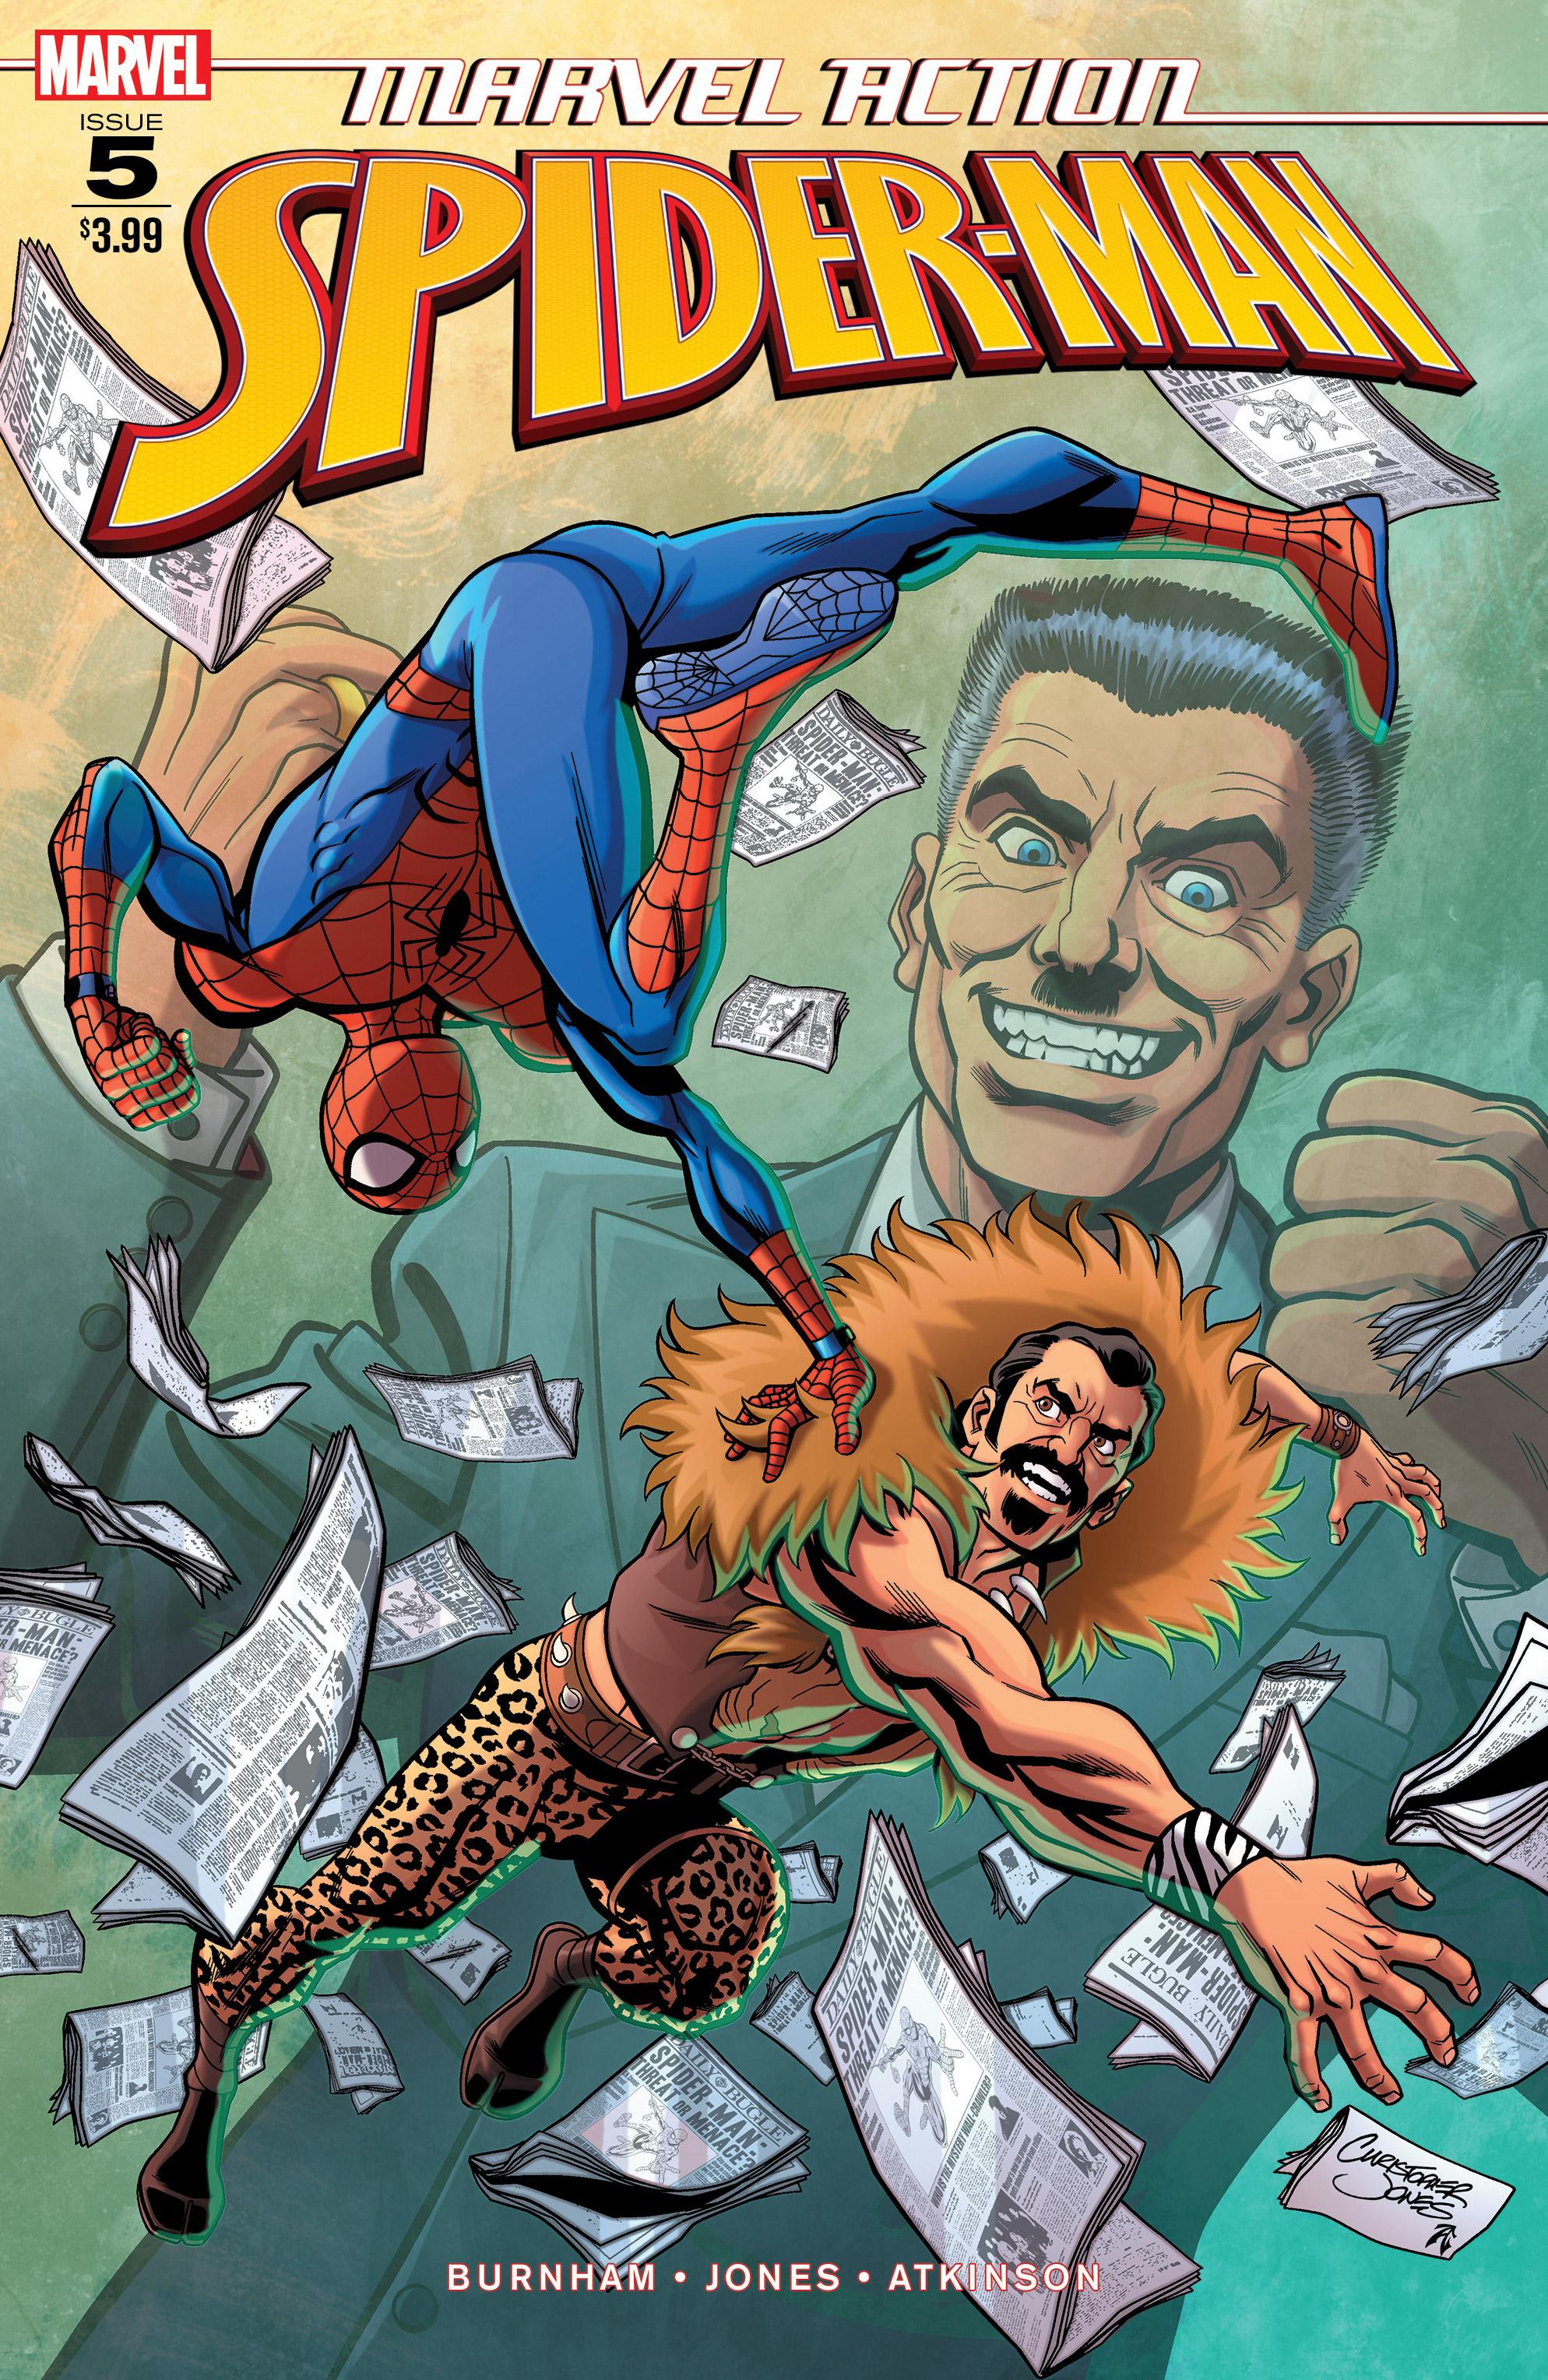 Marvel Action: Spider-Man Vol 1 5